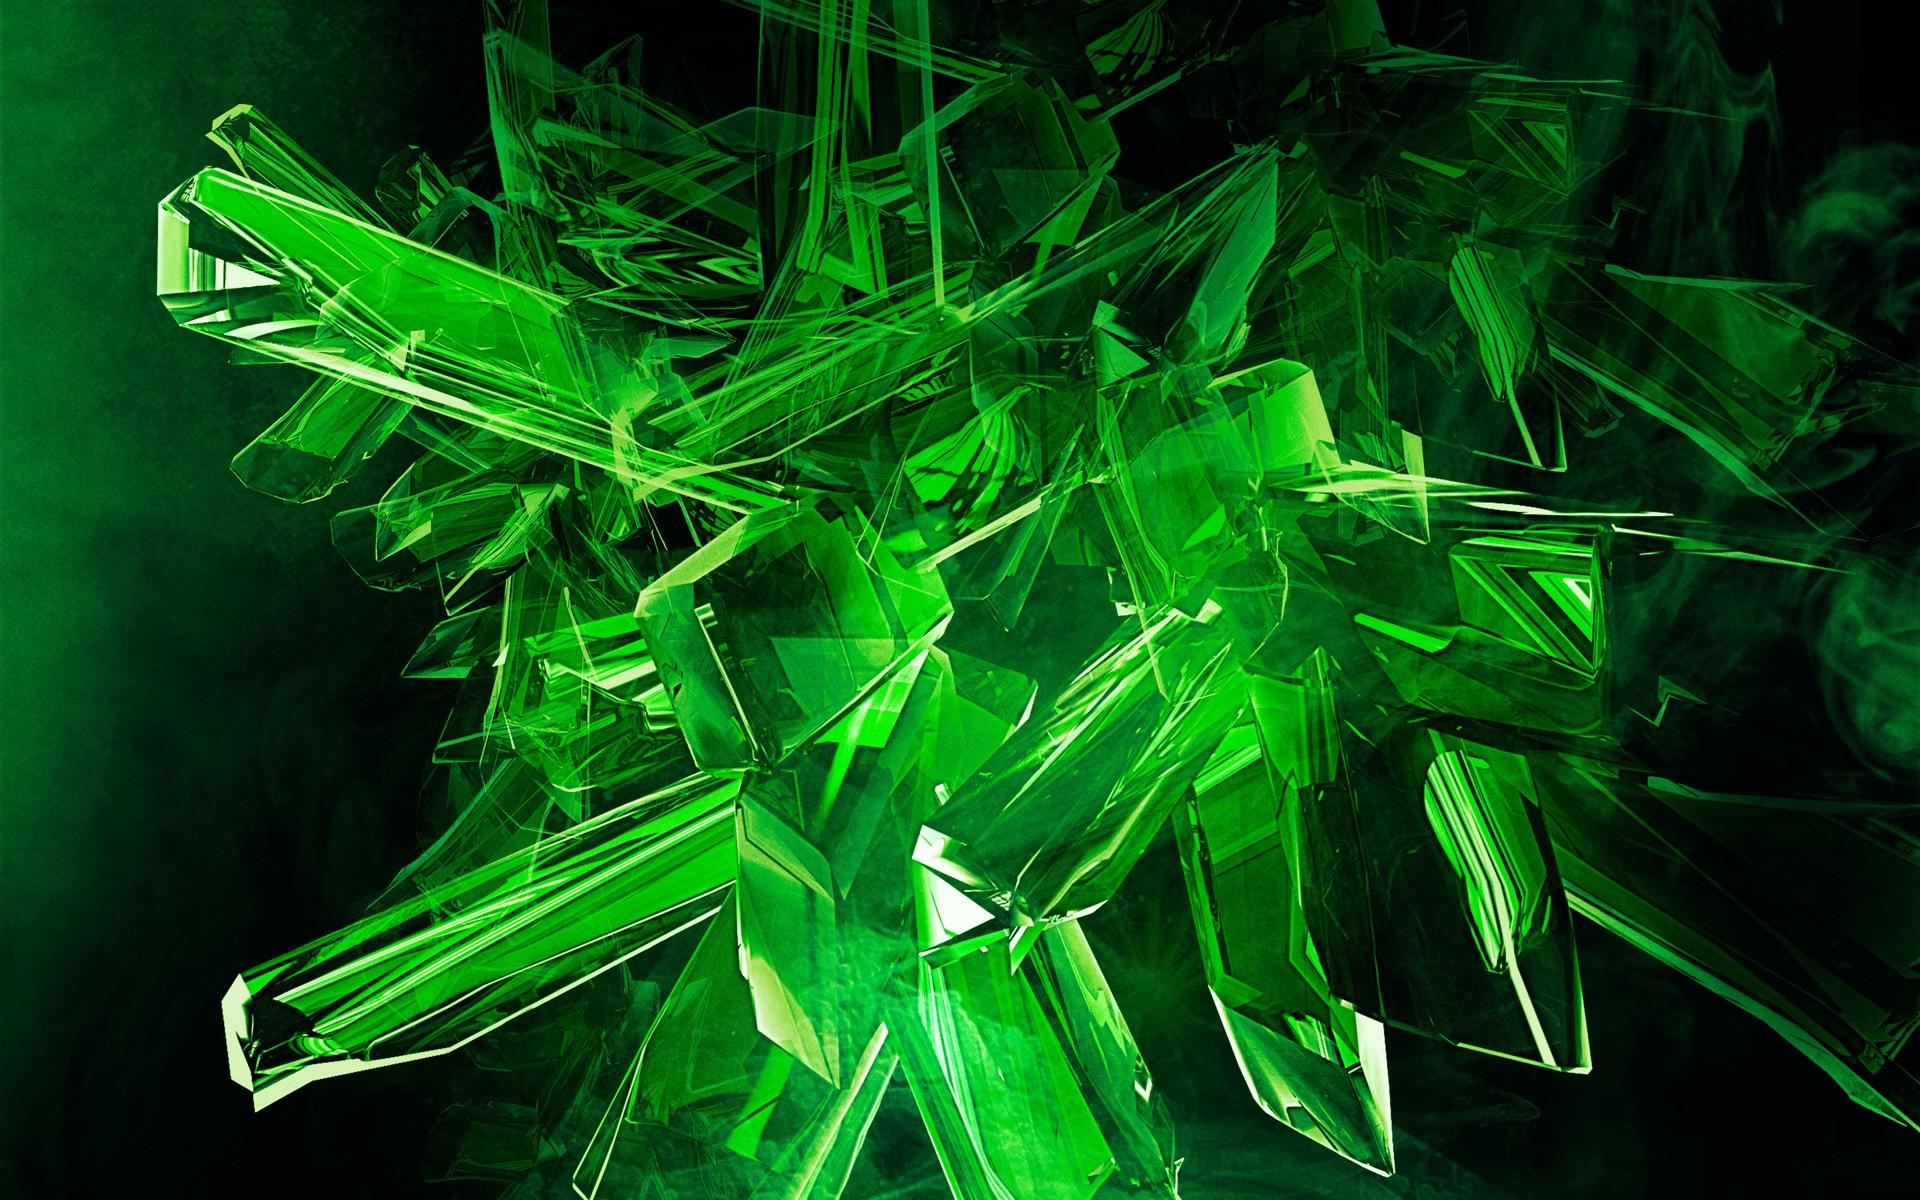 Digital Art Abstract Grass Green Crystal Laser 1920x1200 Px Computer Wallpaper Organism Aquatic Plant